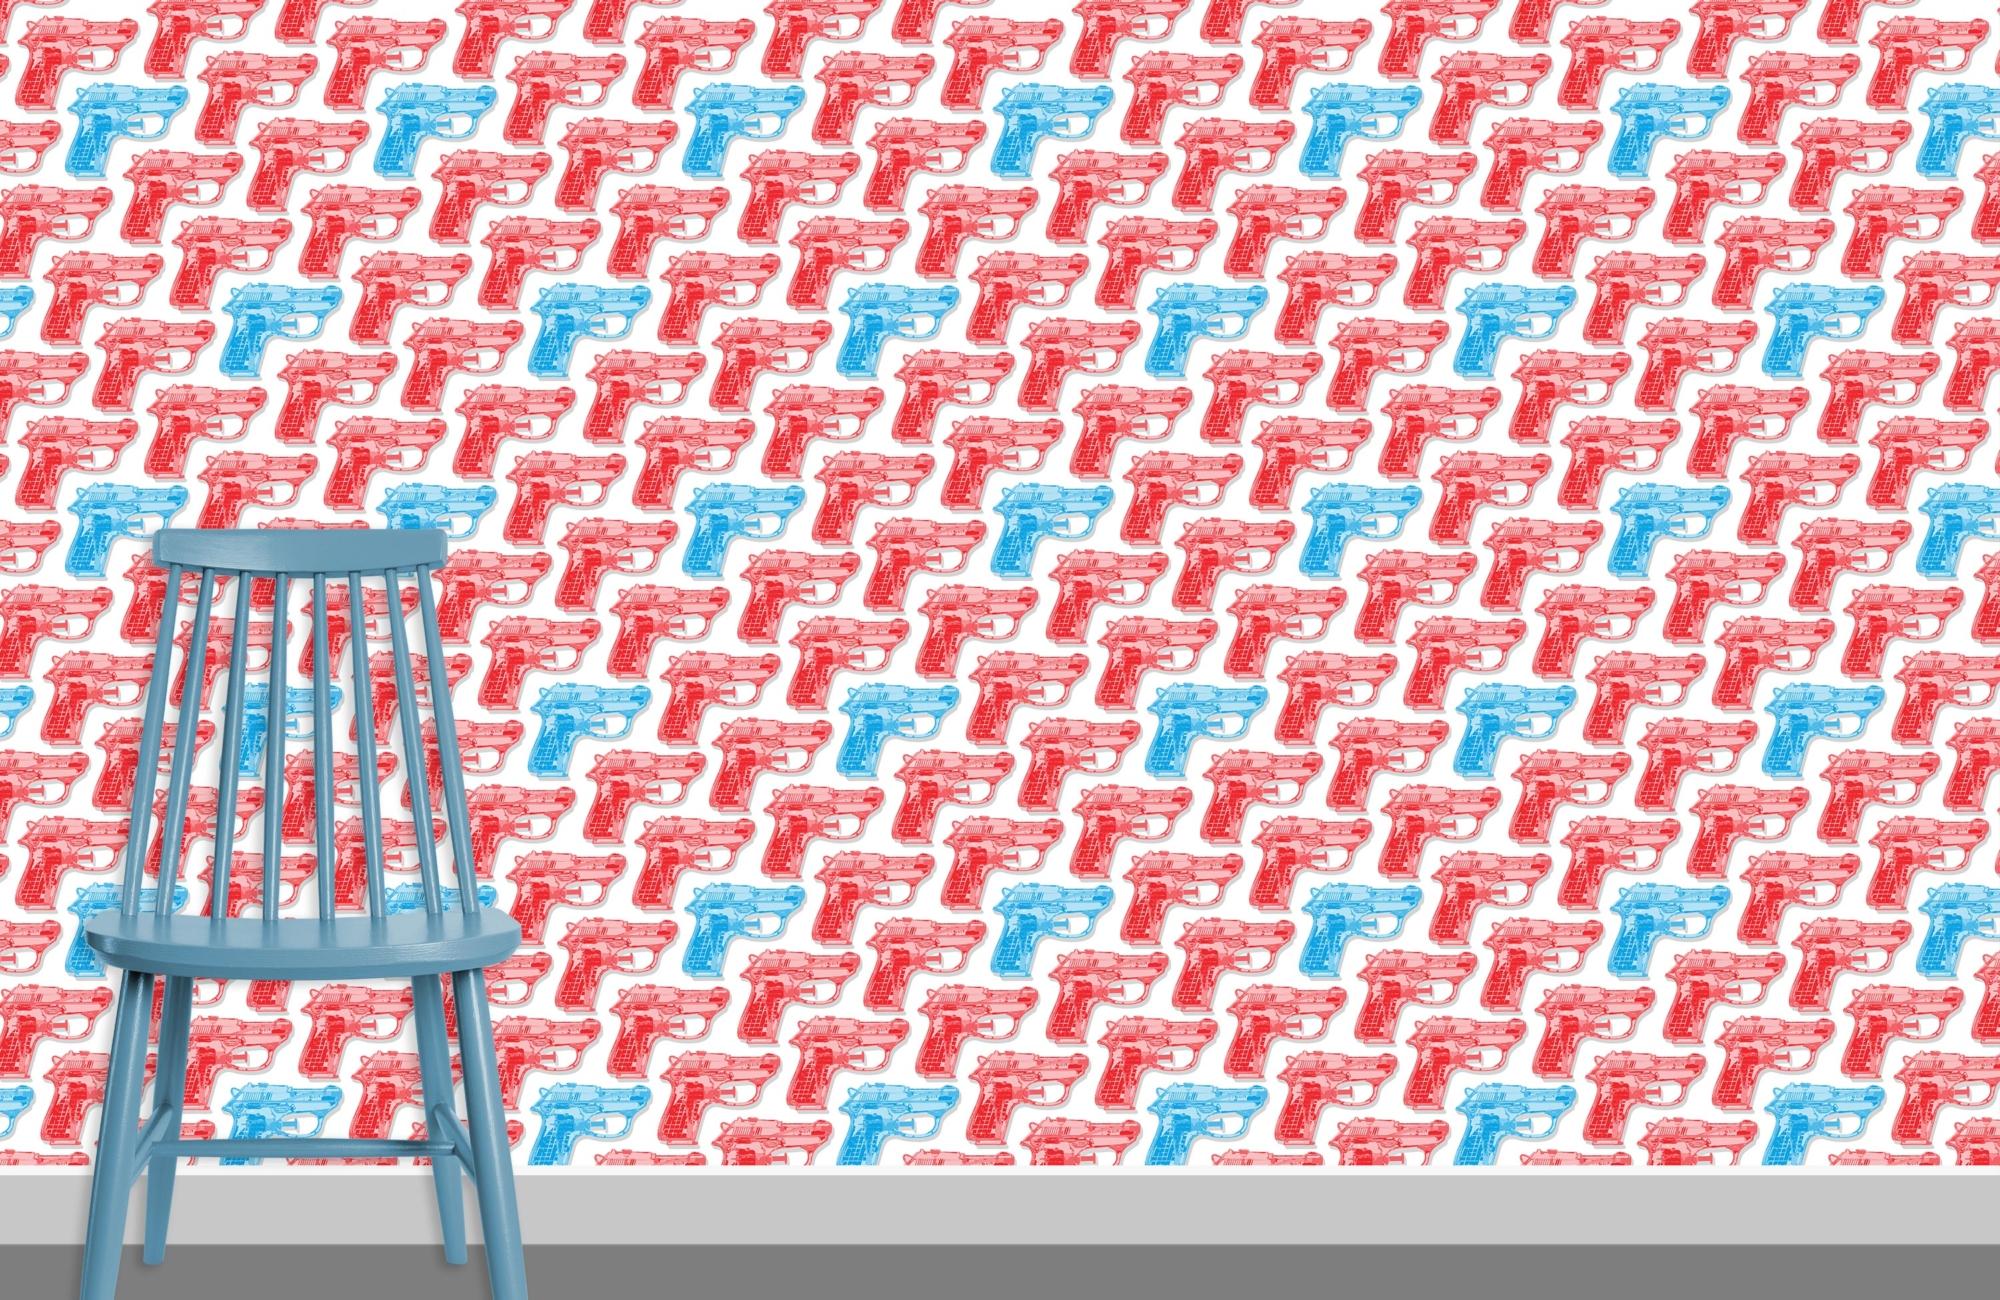 Water Pistols pattern design D red cyan 0 plus chair